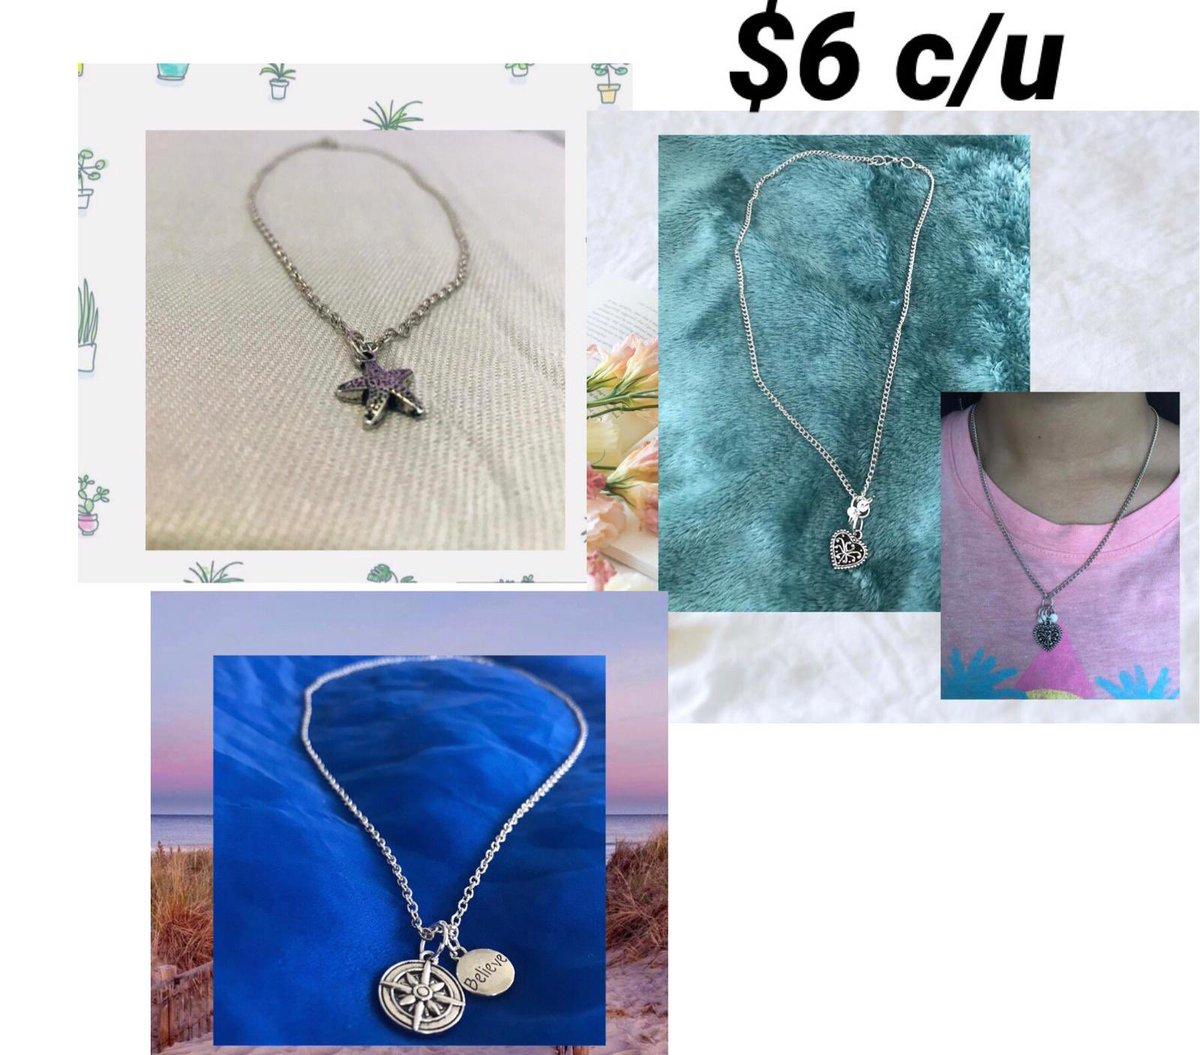 DM para órdenes! #wabisabi #Accessories #hechoamano #handmadejewelry #jewelry #necklace #giftideas #valentinesgifts #collares #shopsmall #SmallBusiness https://t.co/DRojFL44mT